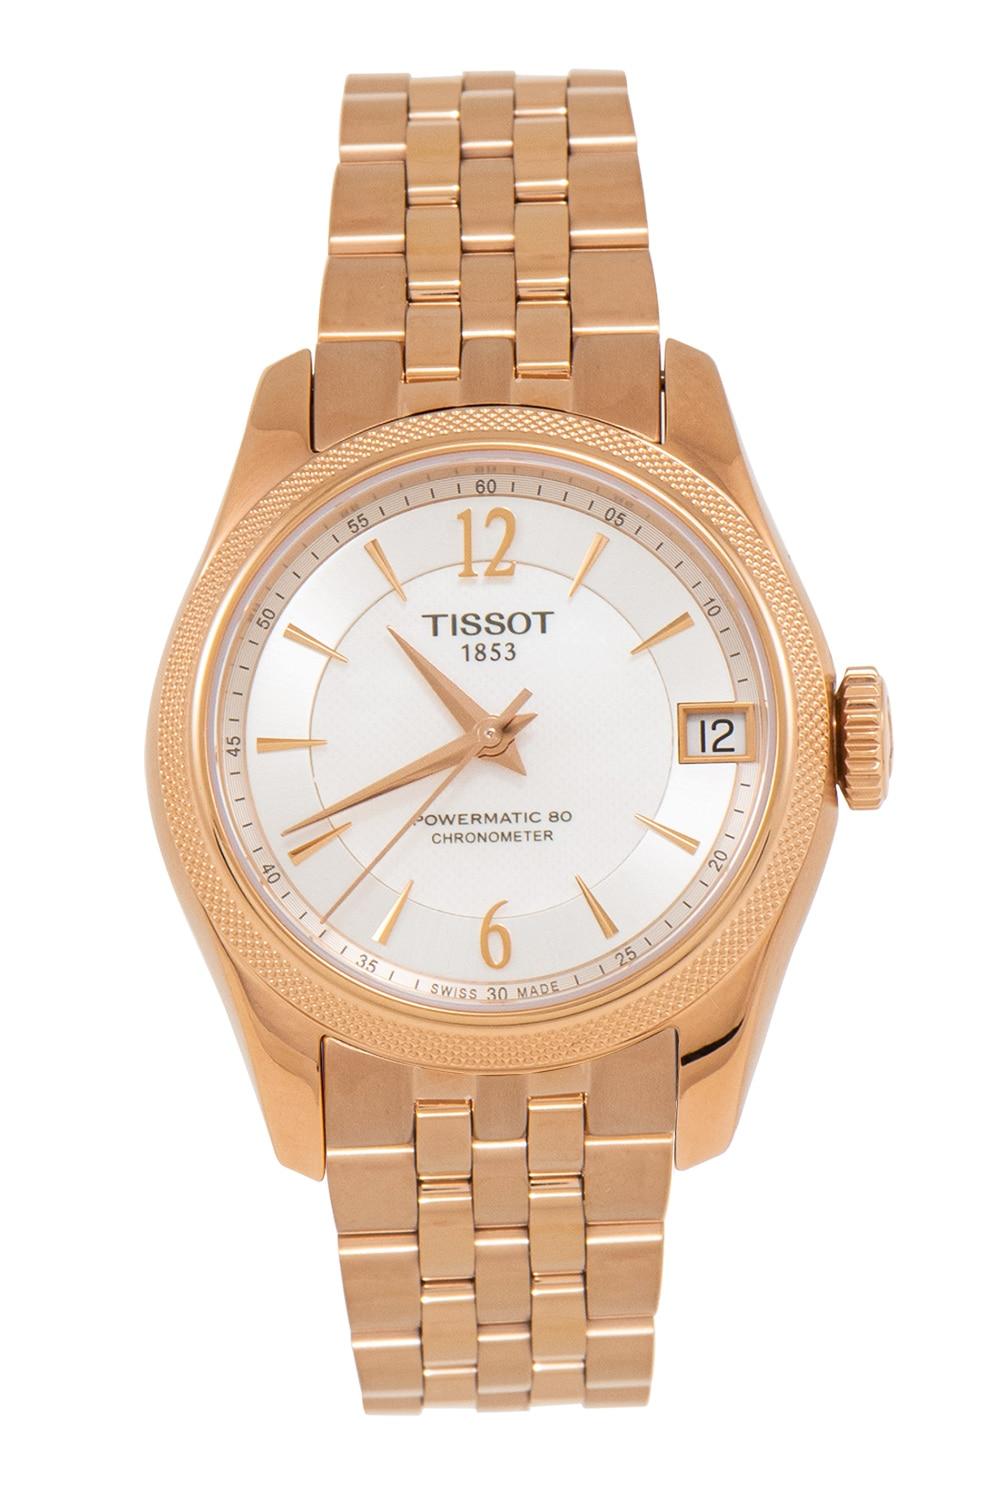 Fotografie Tissot, Ceas automatic din otel inoxidabil Couturier, Auriu rose